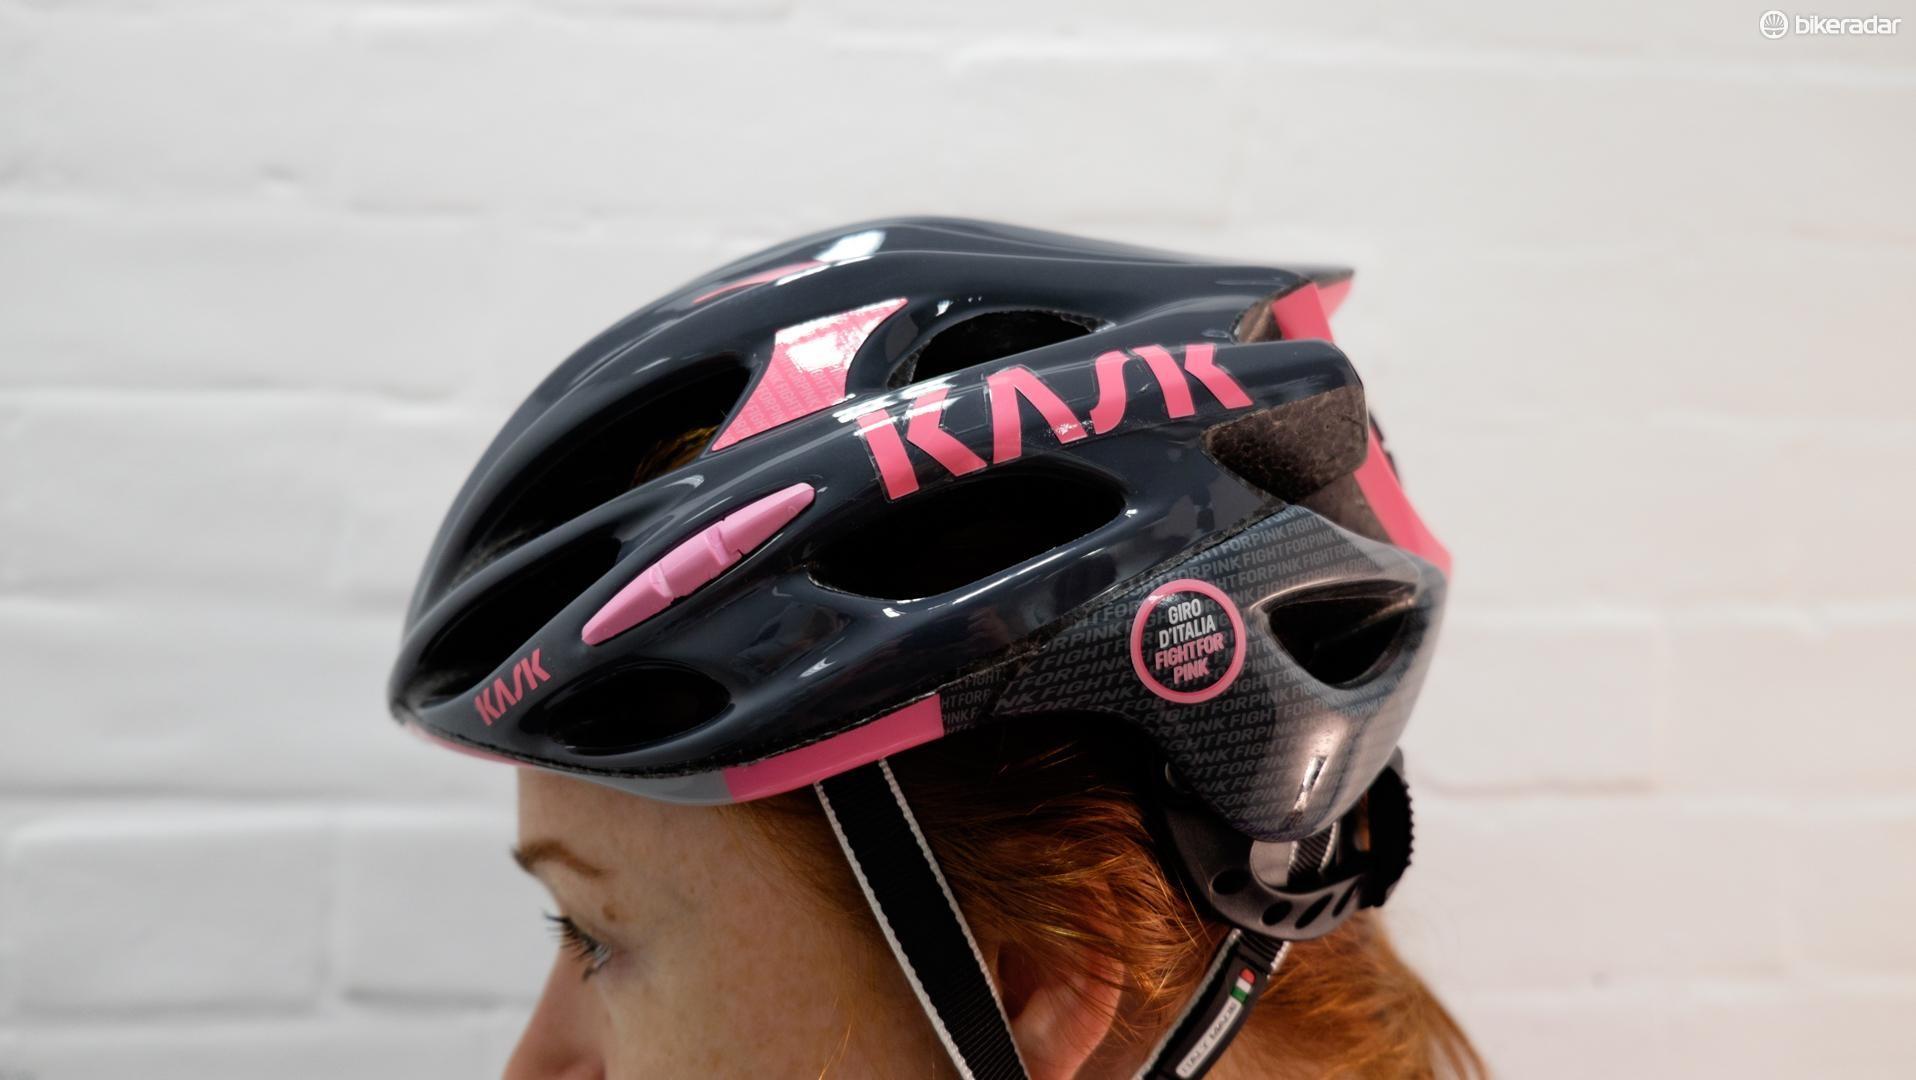 Kask's popular, lightweight Mojito model, in Giro d'Italia colours